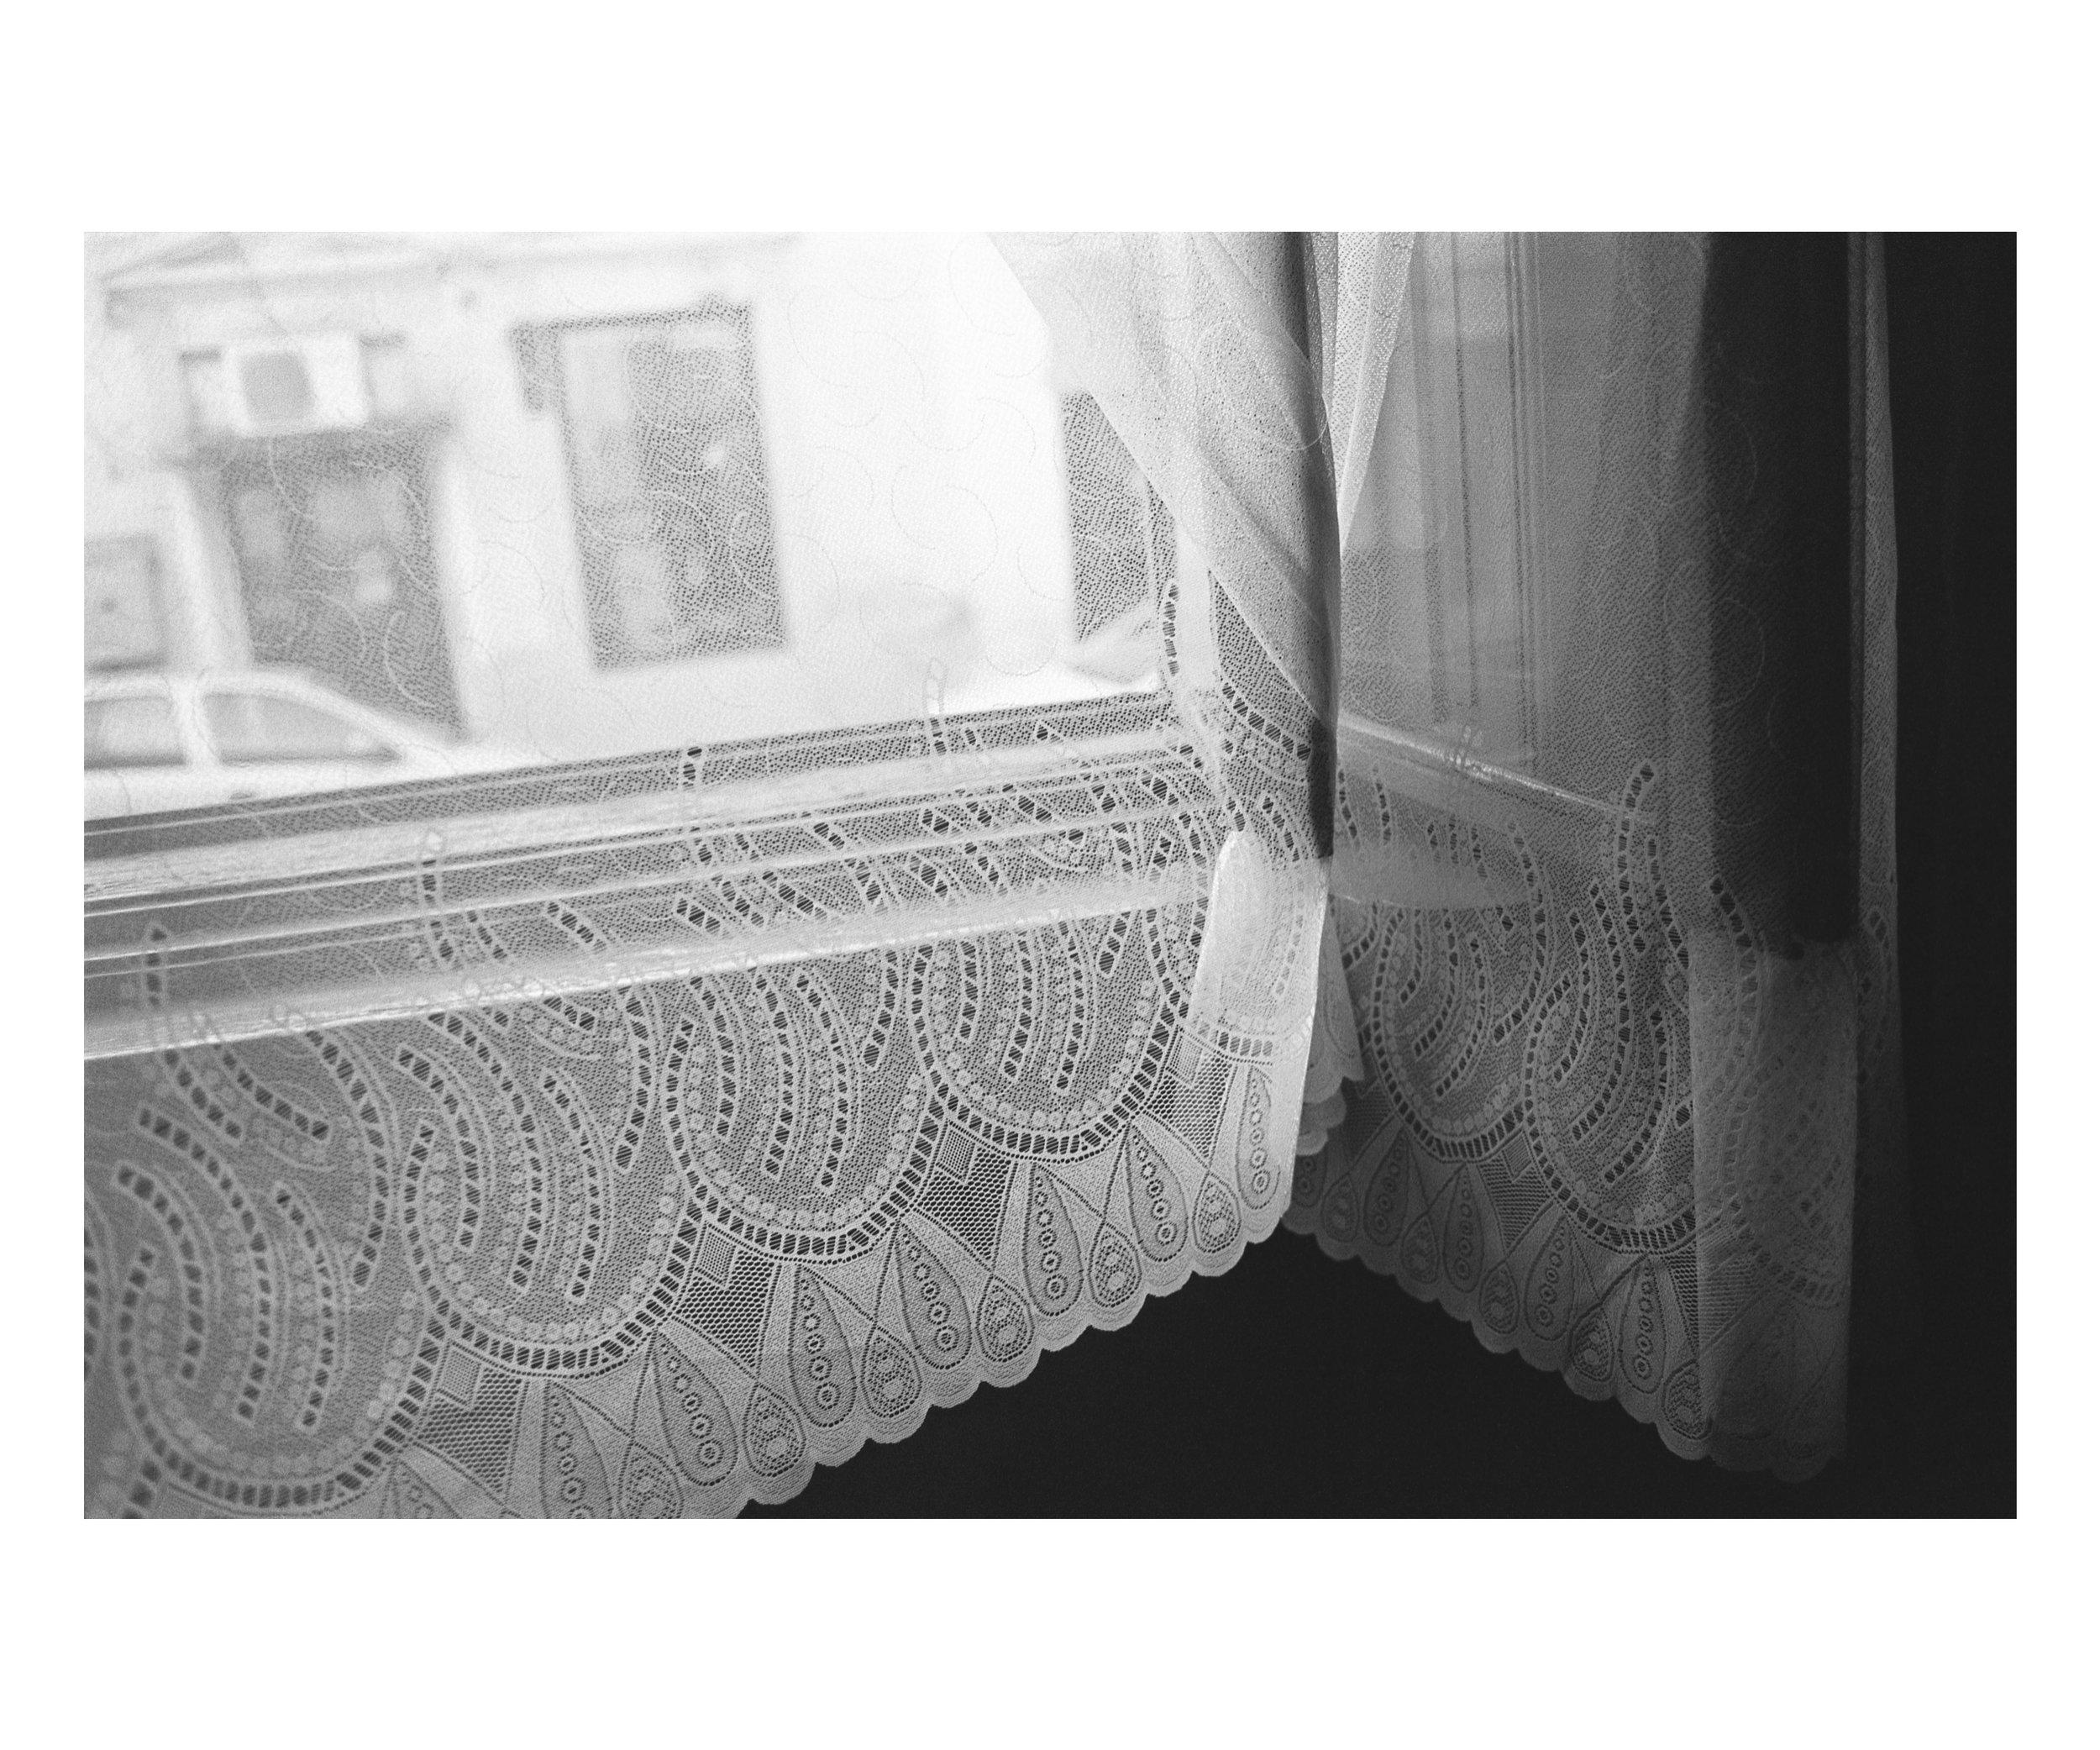 Ovidiu Gordan photobook familiar place photography Romania_38.jpg